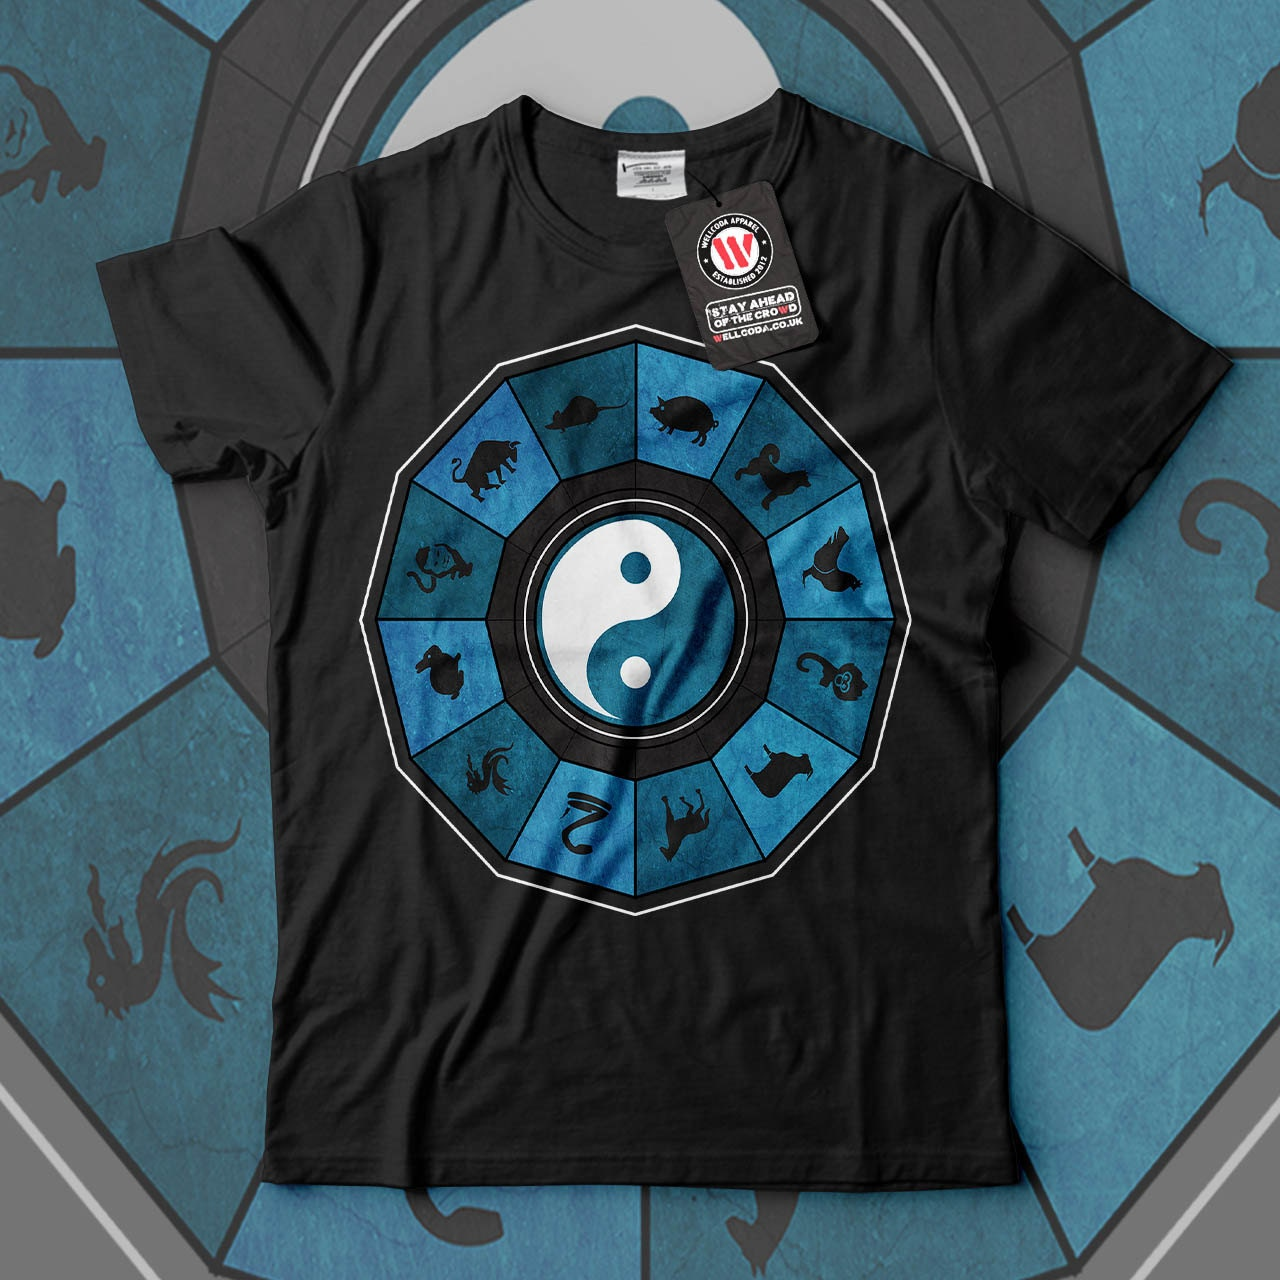 Chinese Zodiac Animal Sign Men Black White Grey Red Royal Blue Tshirt S5XL NEW  Wellcoda y3339